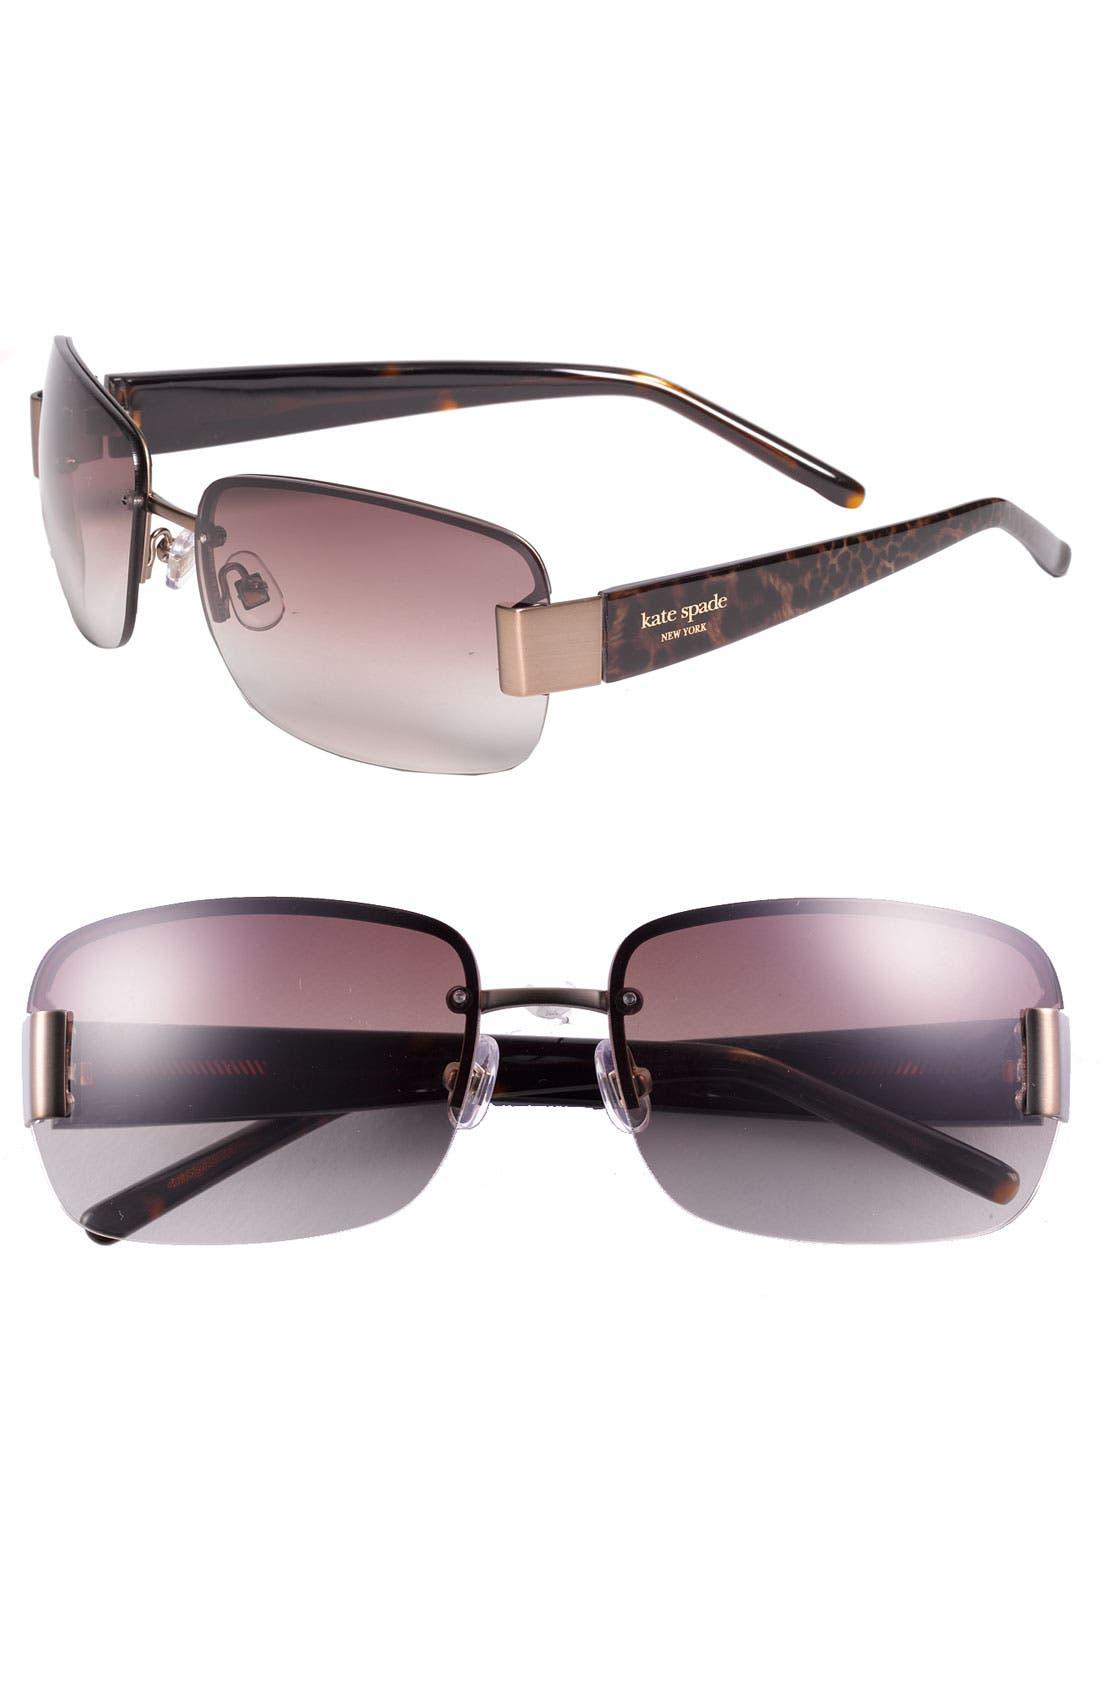 Main Image - kate spade new york 'nia' 60mm rimless rectangular sunglasses